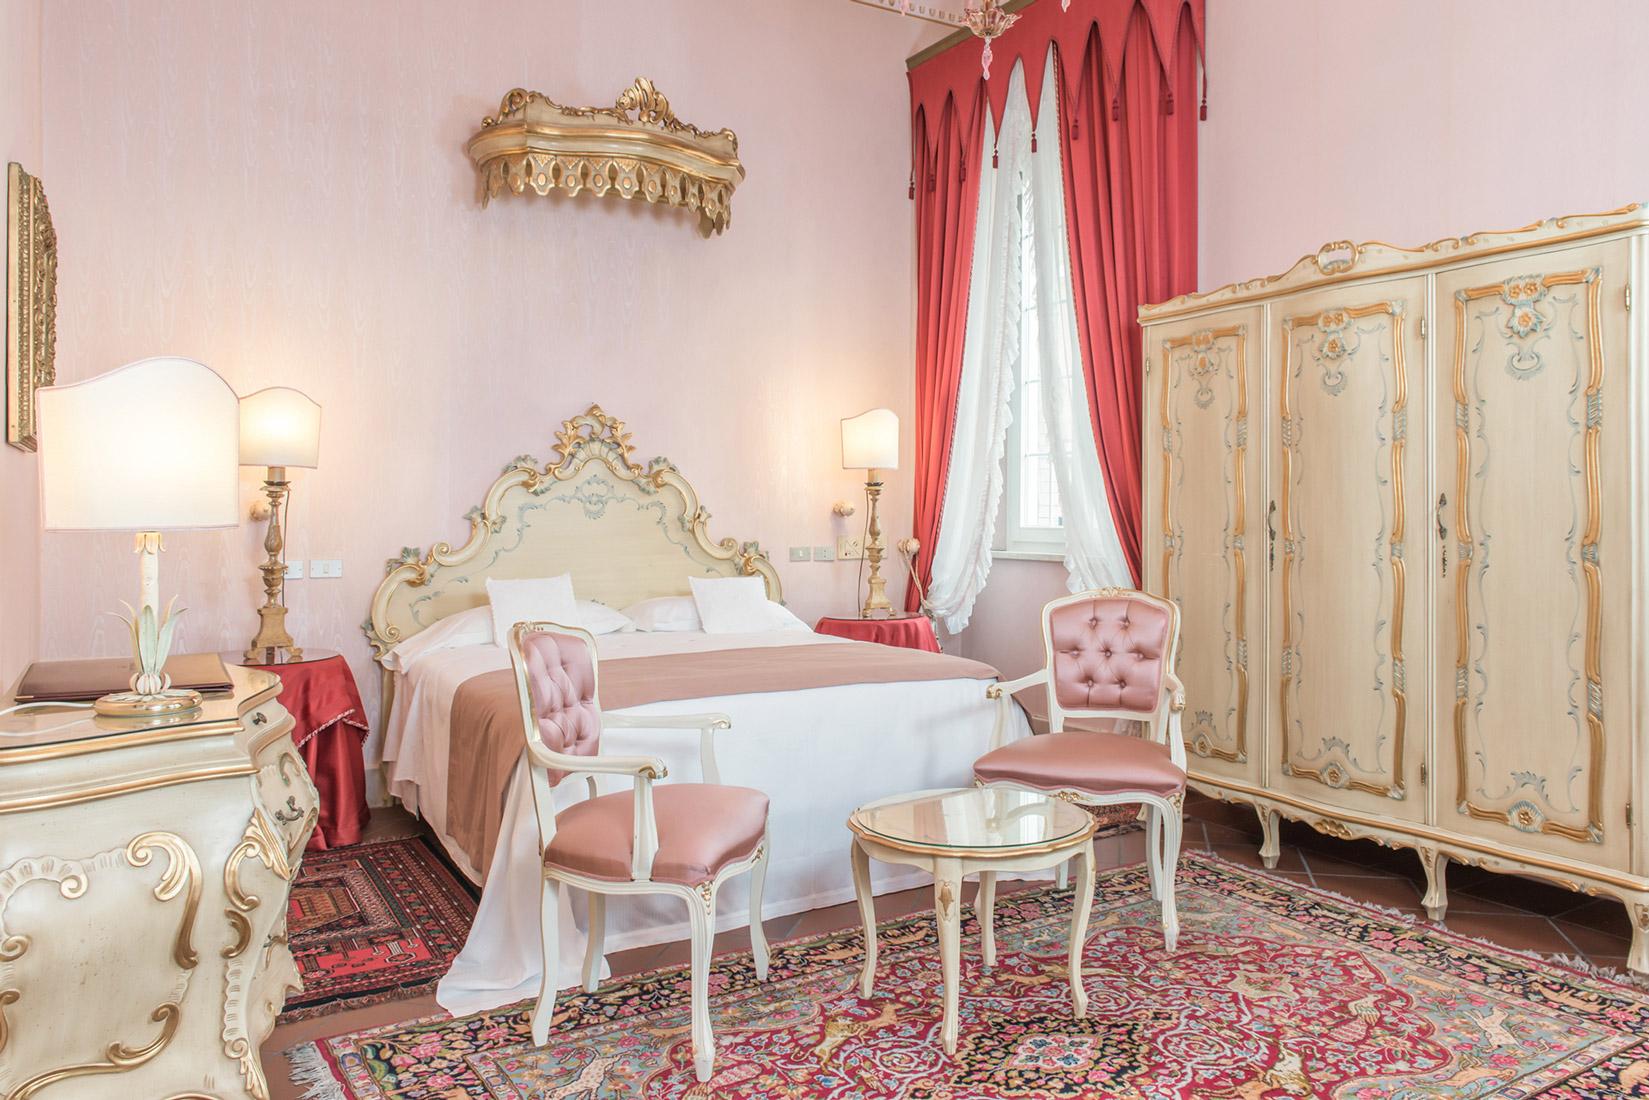 https://www.orlandinifrancesco.com/wp/wp-content/uploads/2019/01/Duchessa-Isabella-Ferrara-Camere-3.jpg